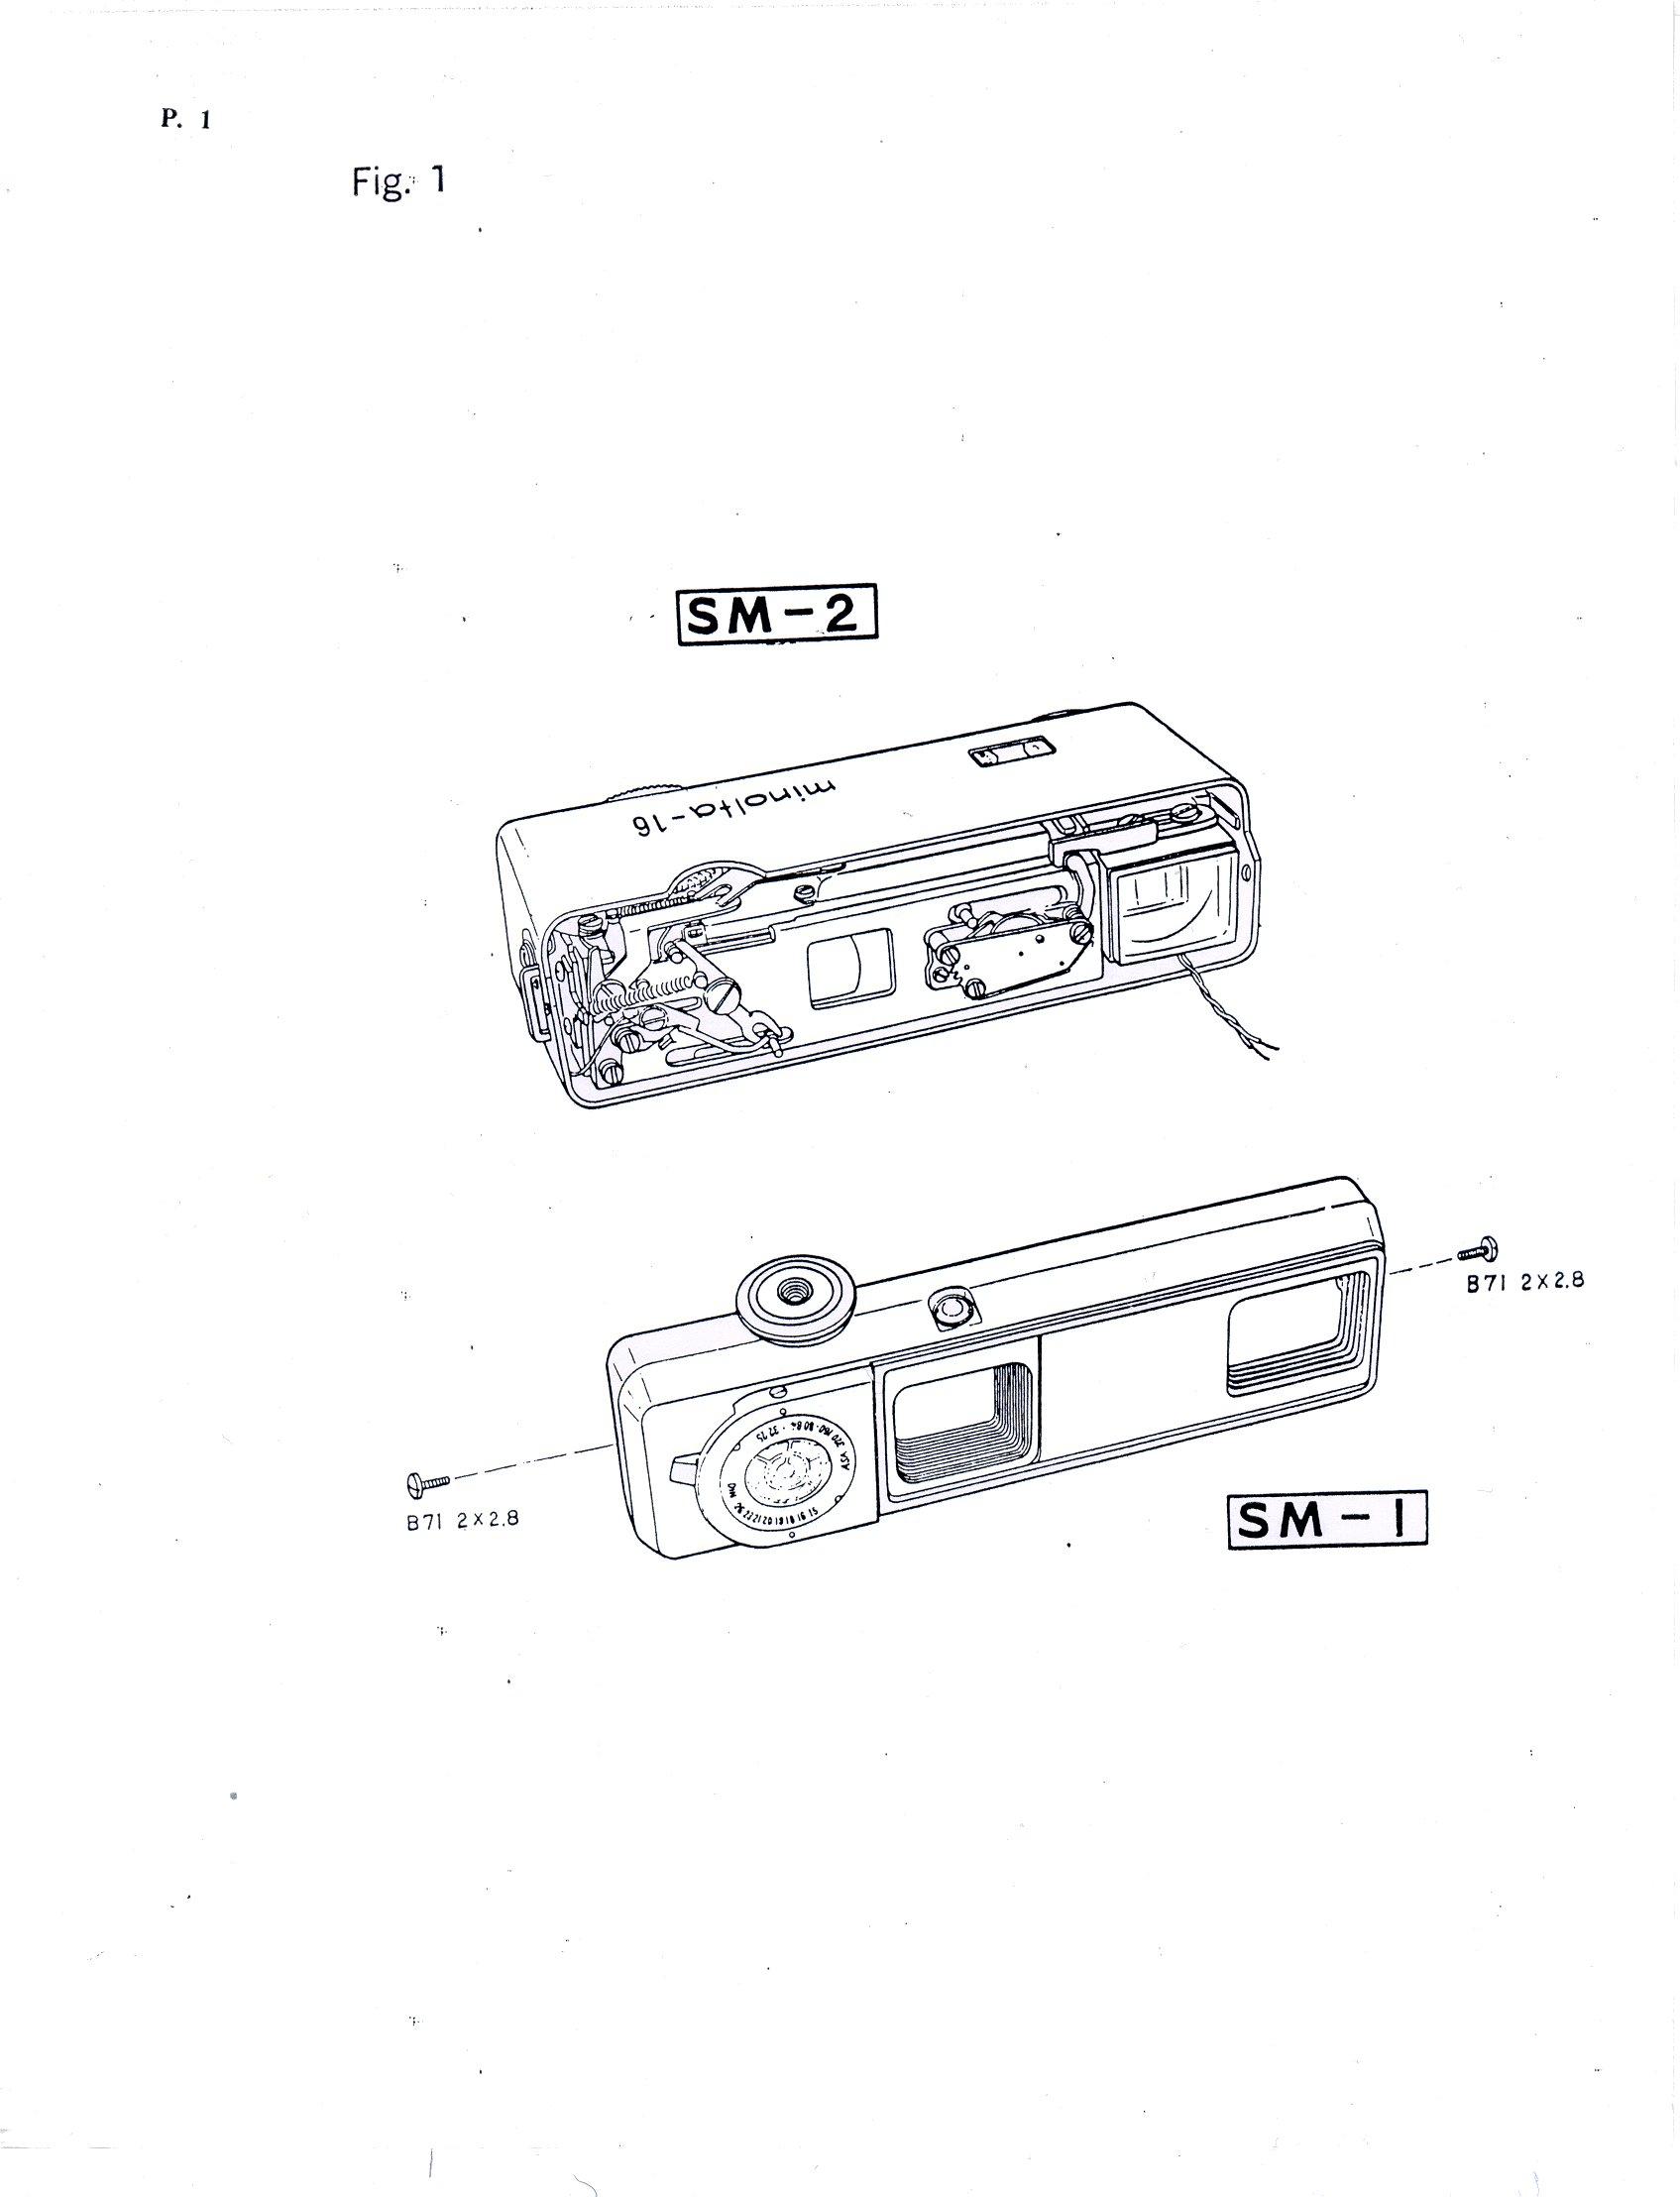 vauxhall corsa wiring diagram radio with 10 Inch Car Radio on 2001 Explorer Fuse Box Diagram also 10 Inch Car Radio additionally Cat 416 Wiring Diagram besides Nos Engine Diagram likewise Saturn Astra Engine  partment Diagram.